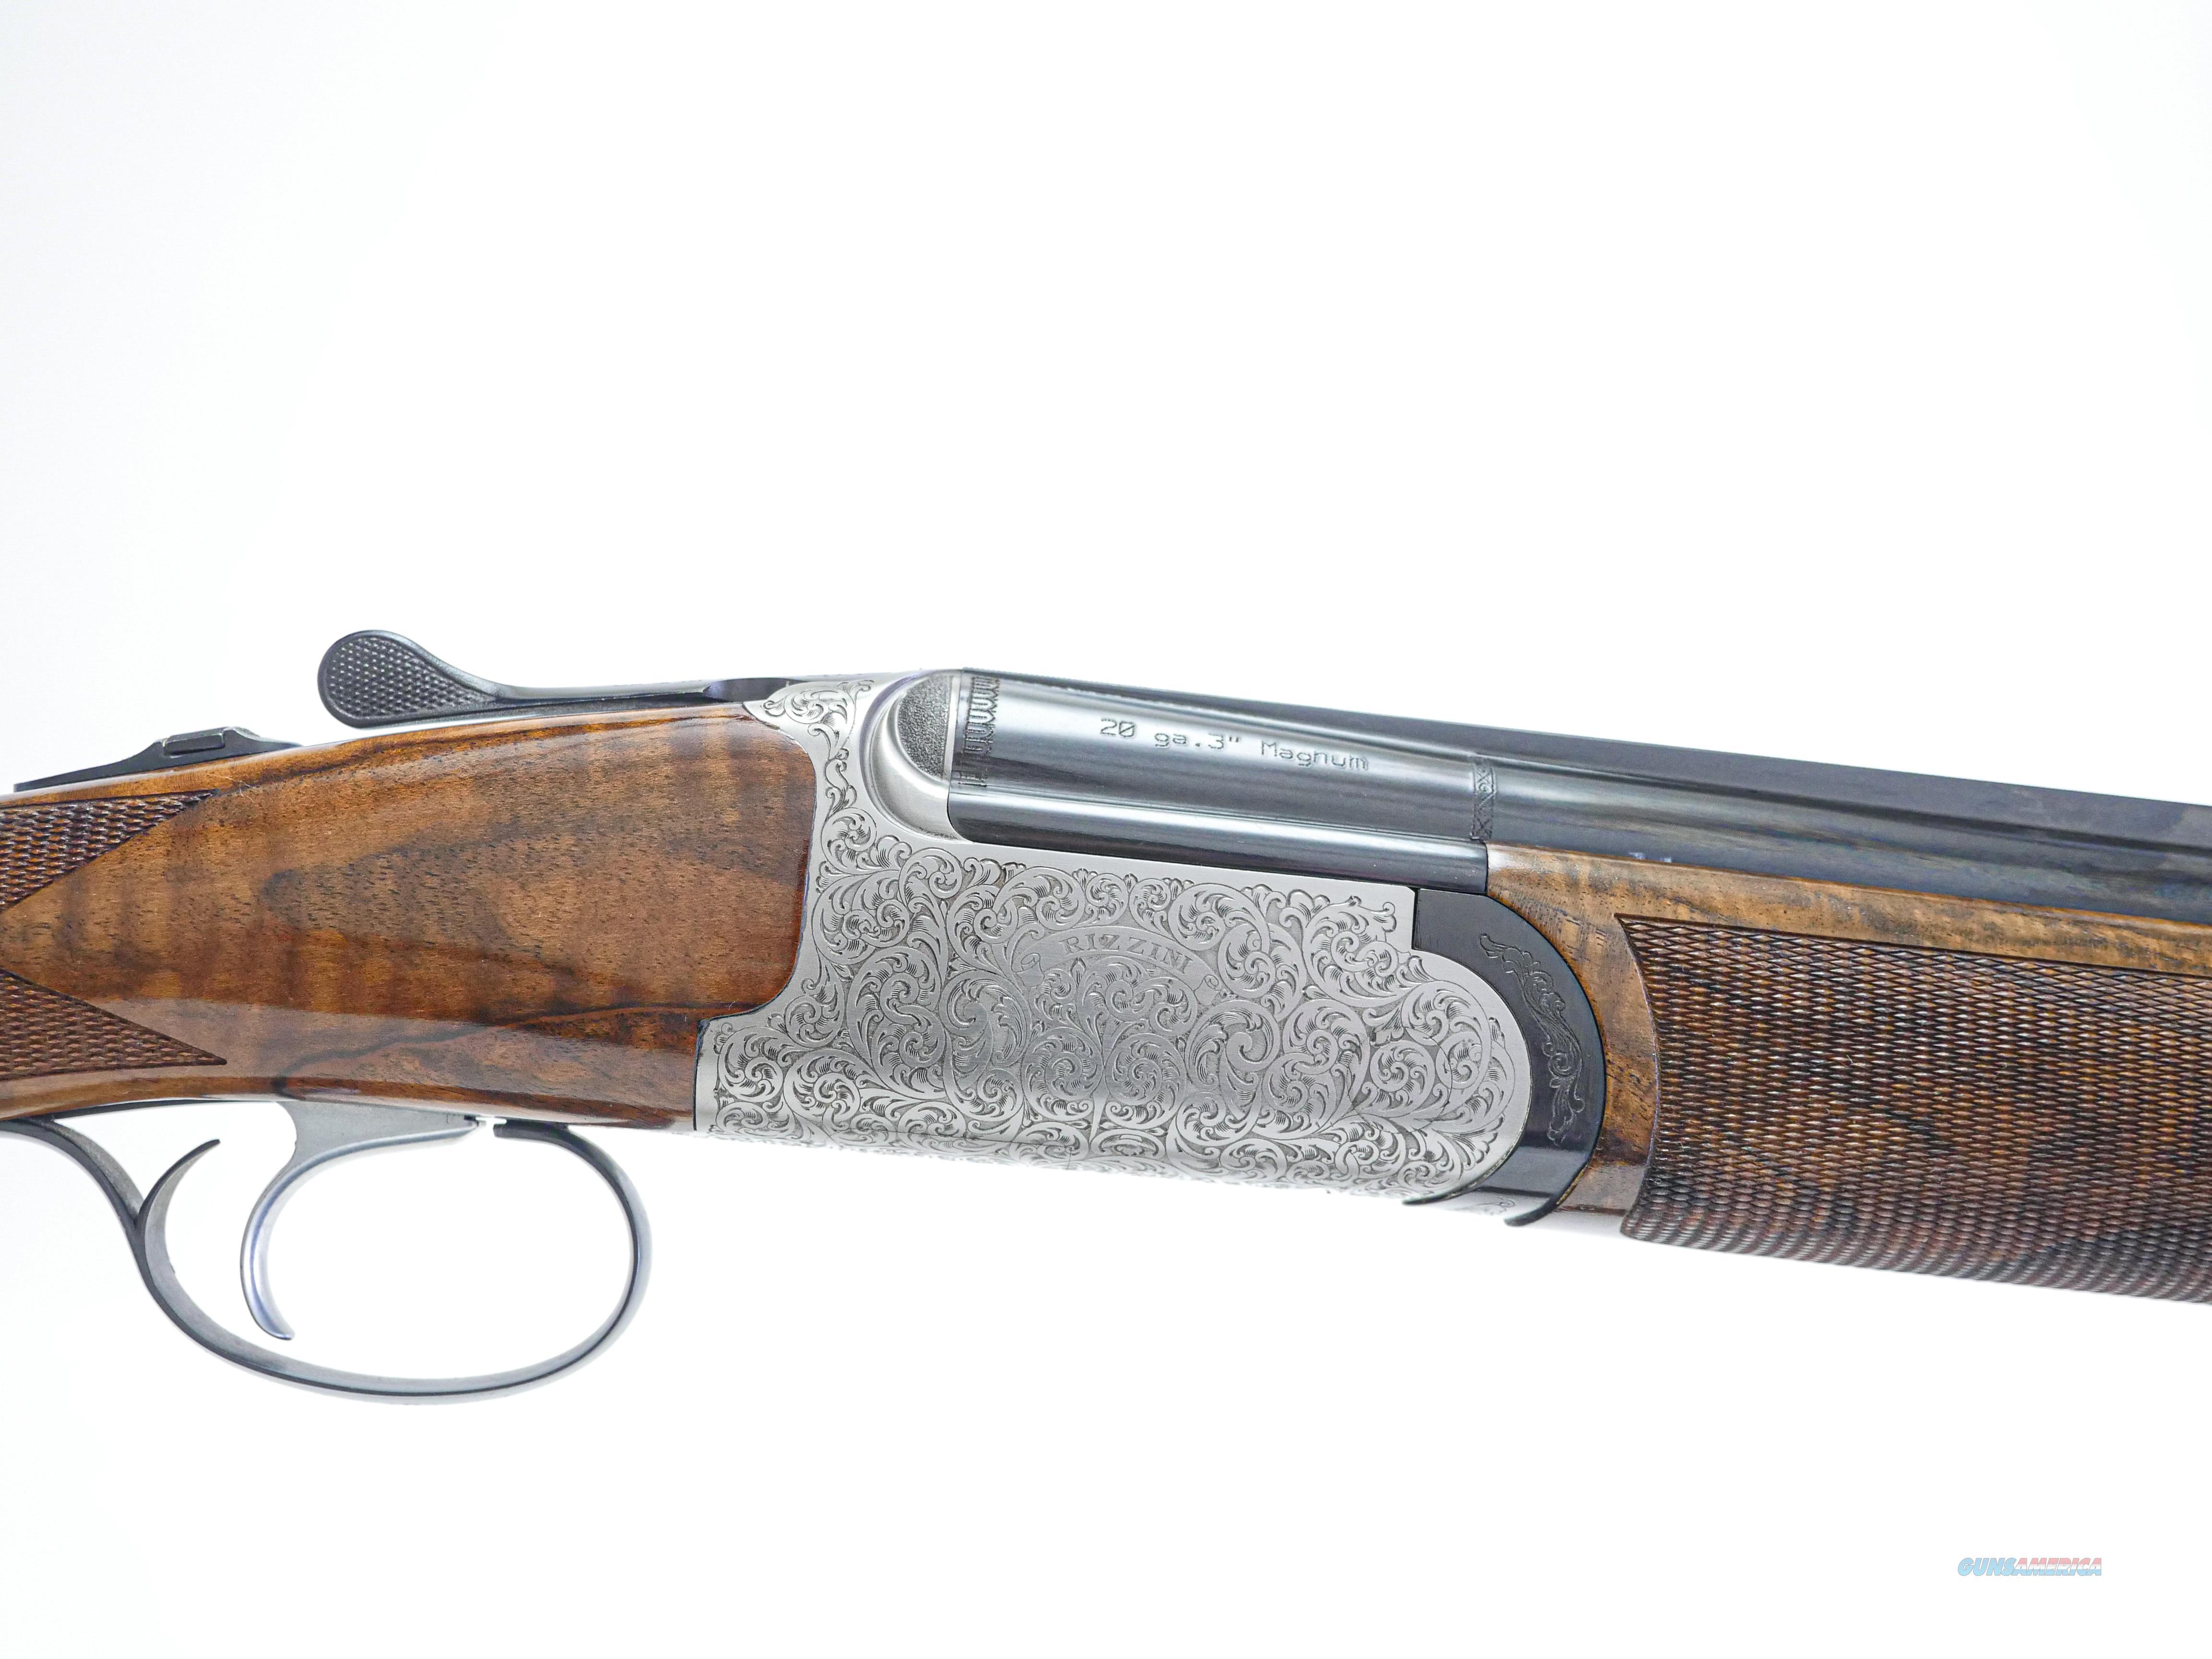 "B. Rizzini - Round Body EL, 20ga. 29"" Barrels. #12533  Guns > Shotguns > Rizzini Shotguns"